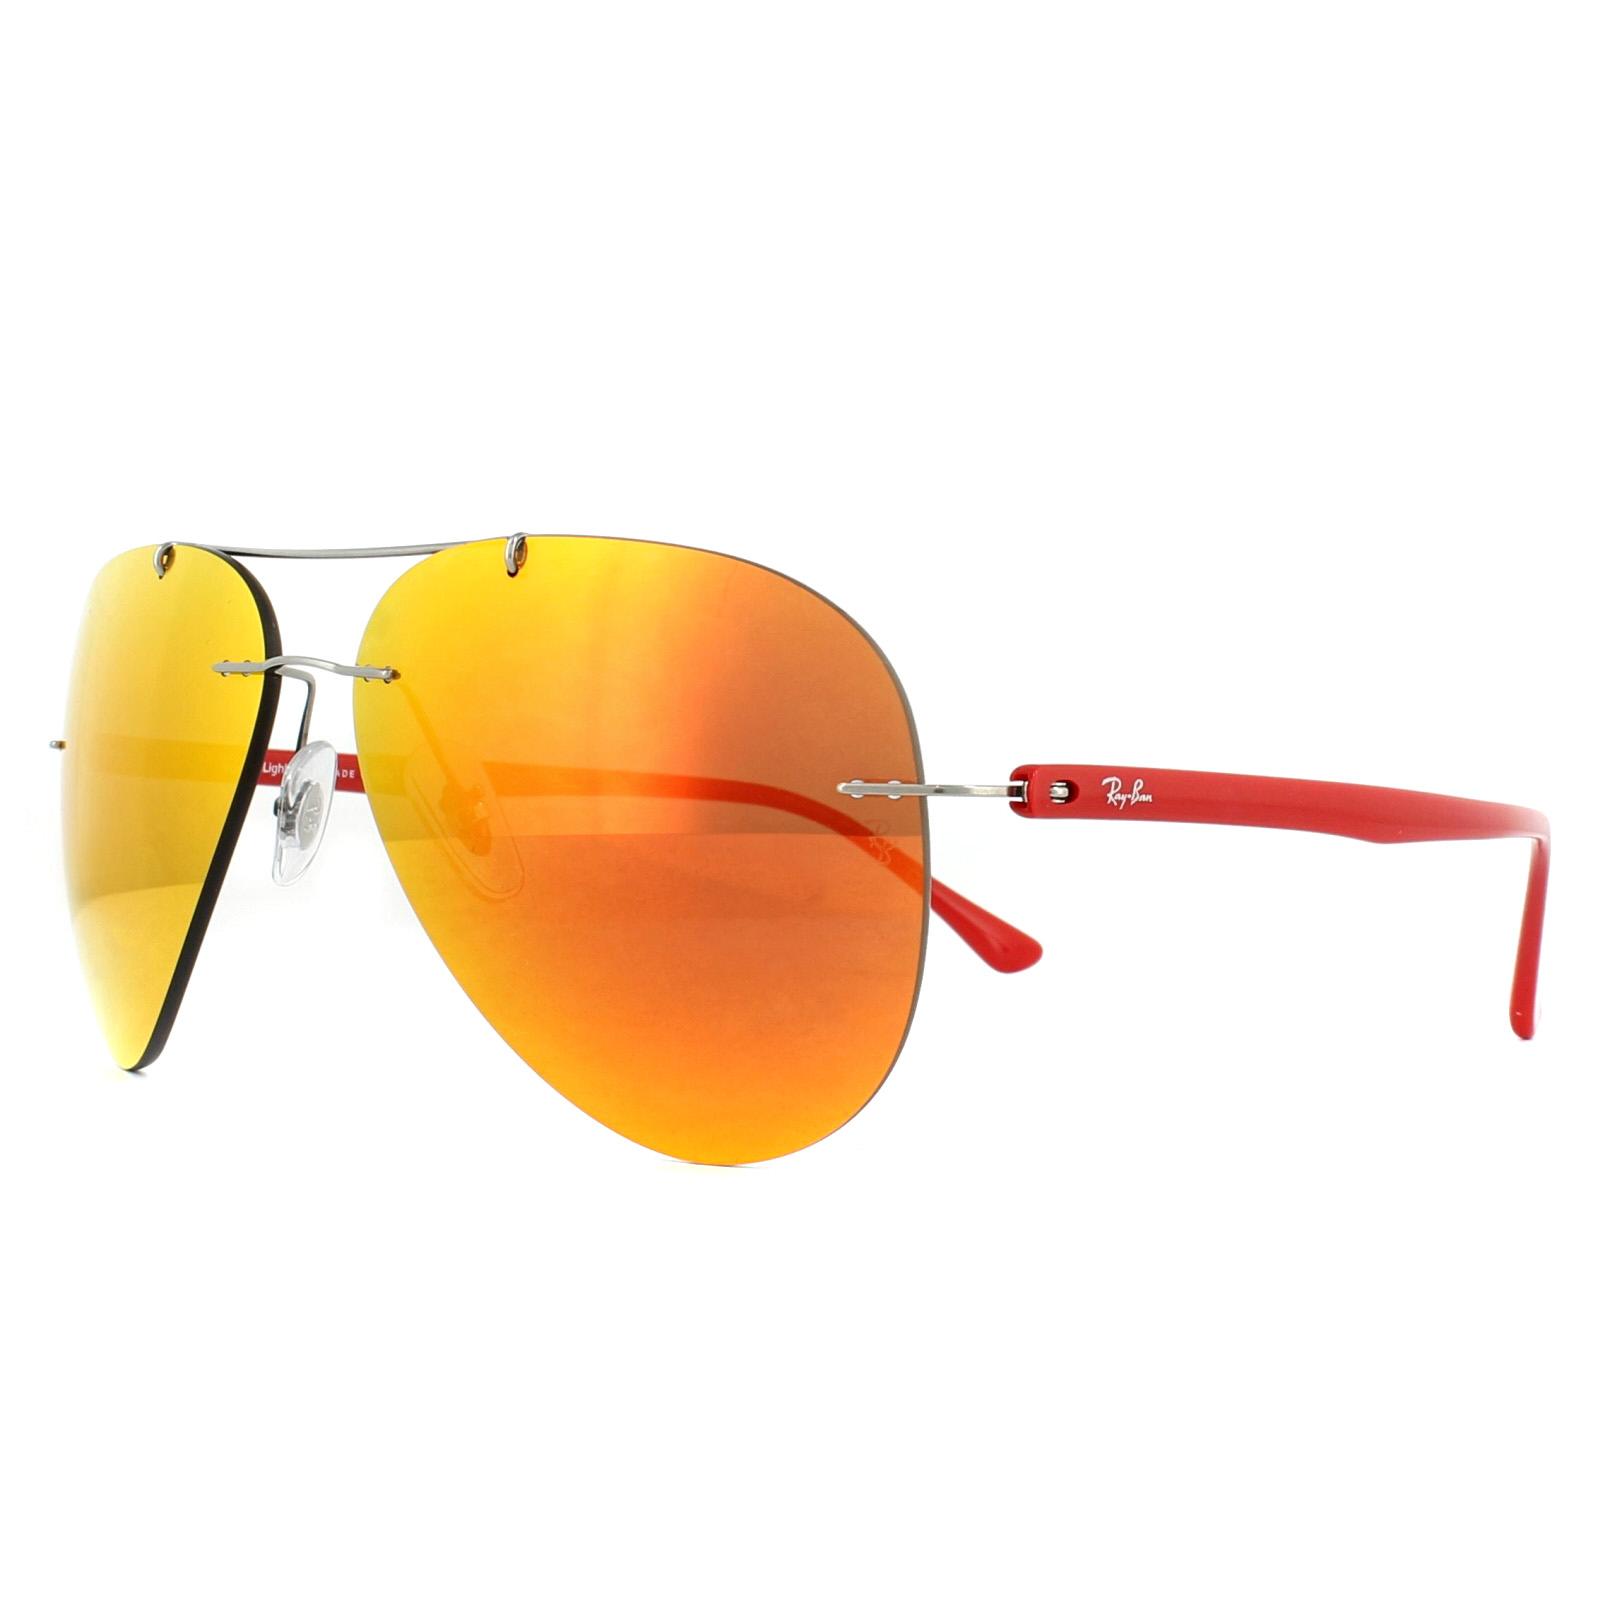 4abbd9ded8e Cheap Ray-Ban 8058 Sunglasses - Discounted Sunglasses